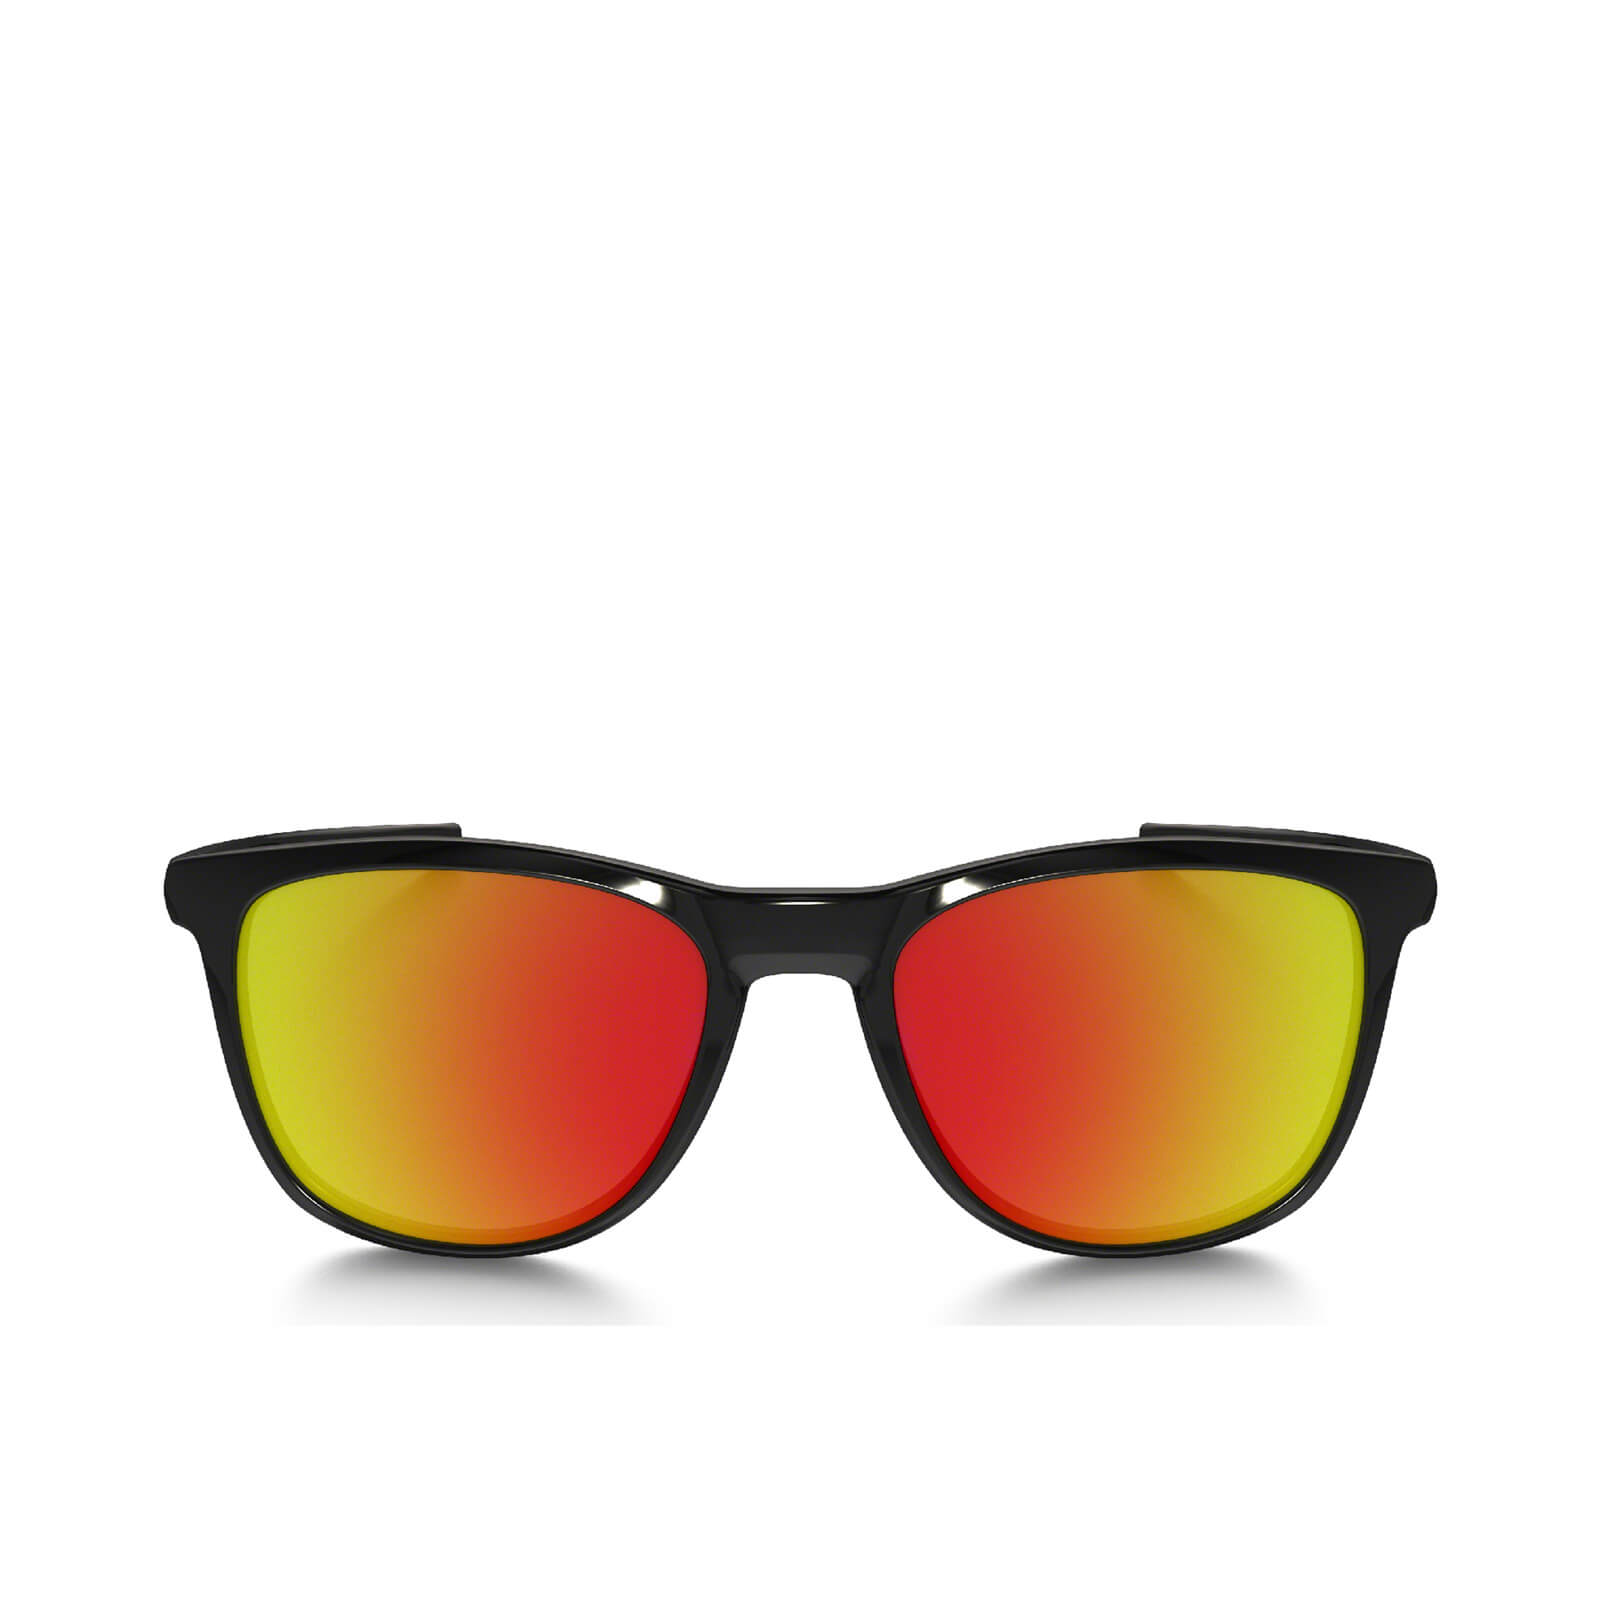 607abe5bb75 Oakley Trillbe X Polarized Sunglasses - Black Ruby Iridium ...